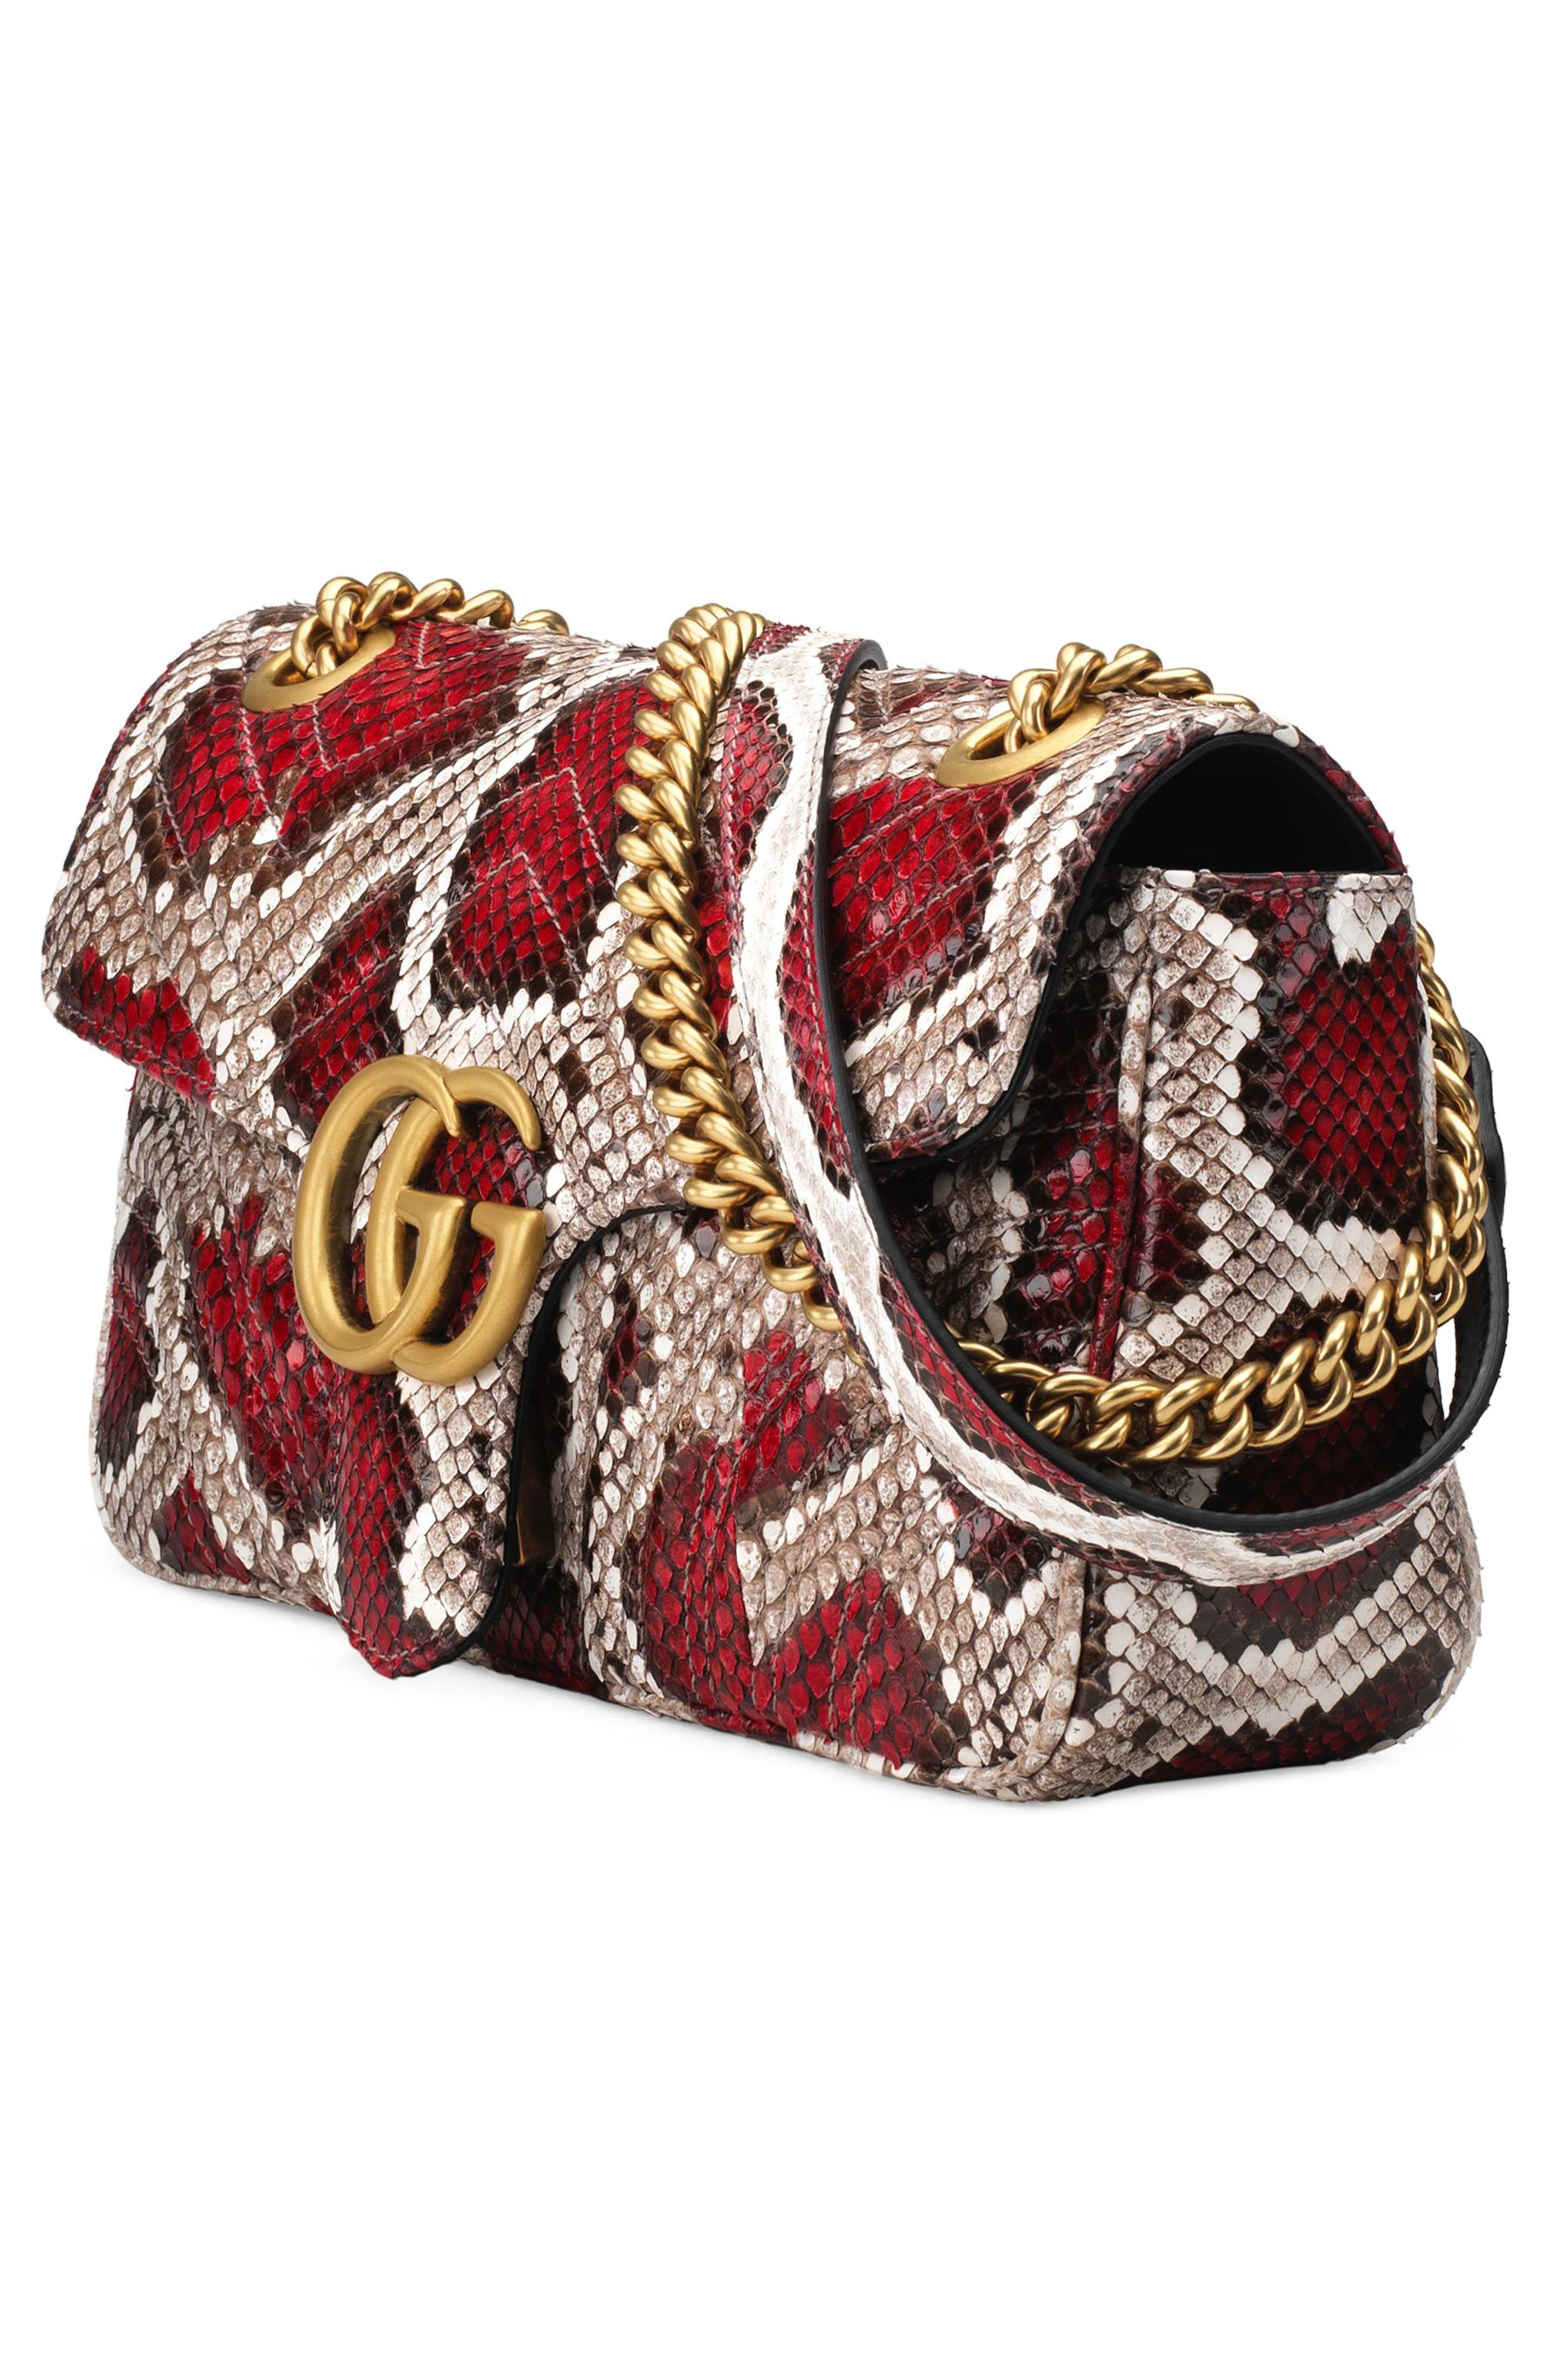 Marmont 2.0 Genuine Python Shoulder Bag,                             Alternate thumbnail 4, color,                             642